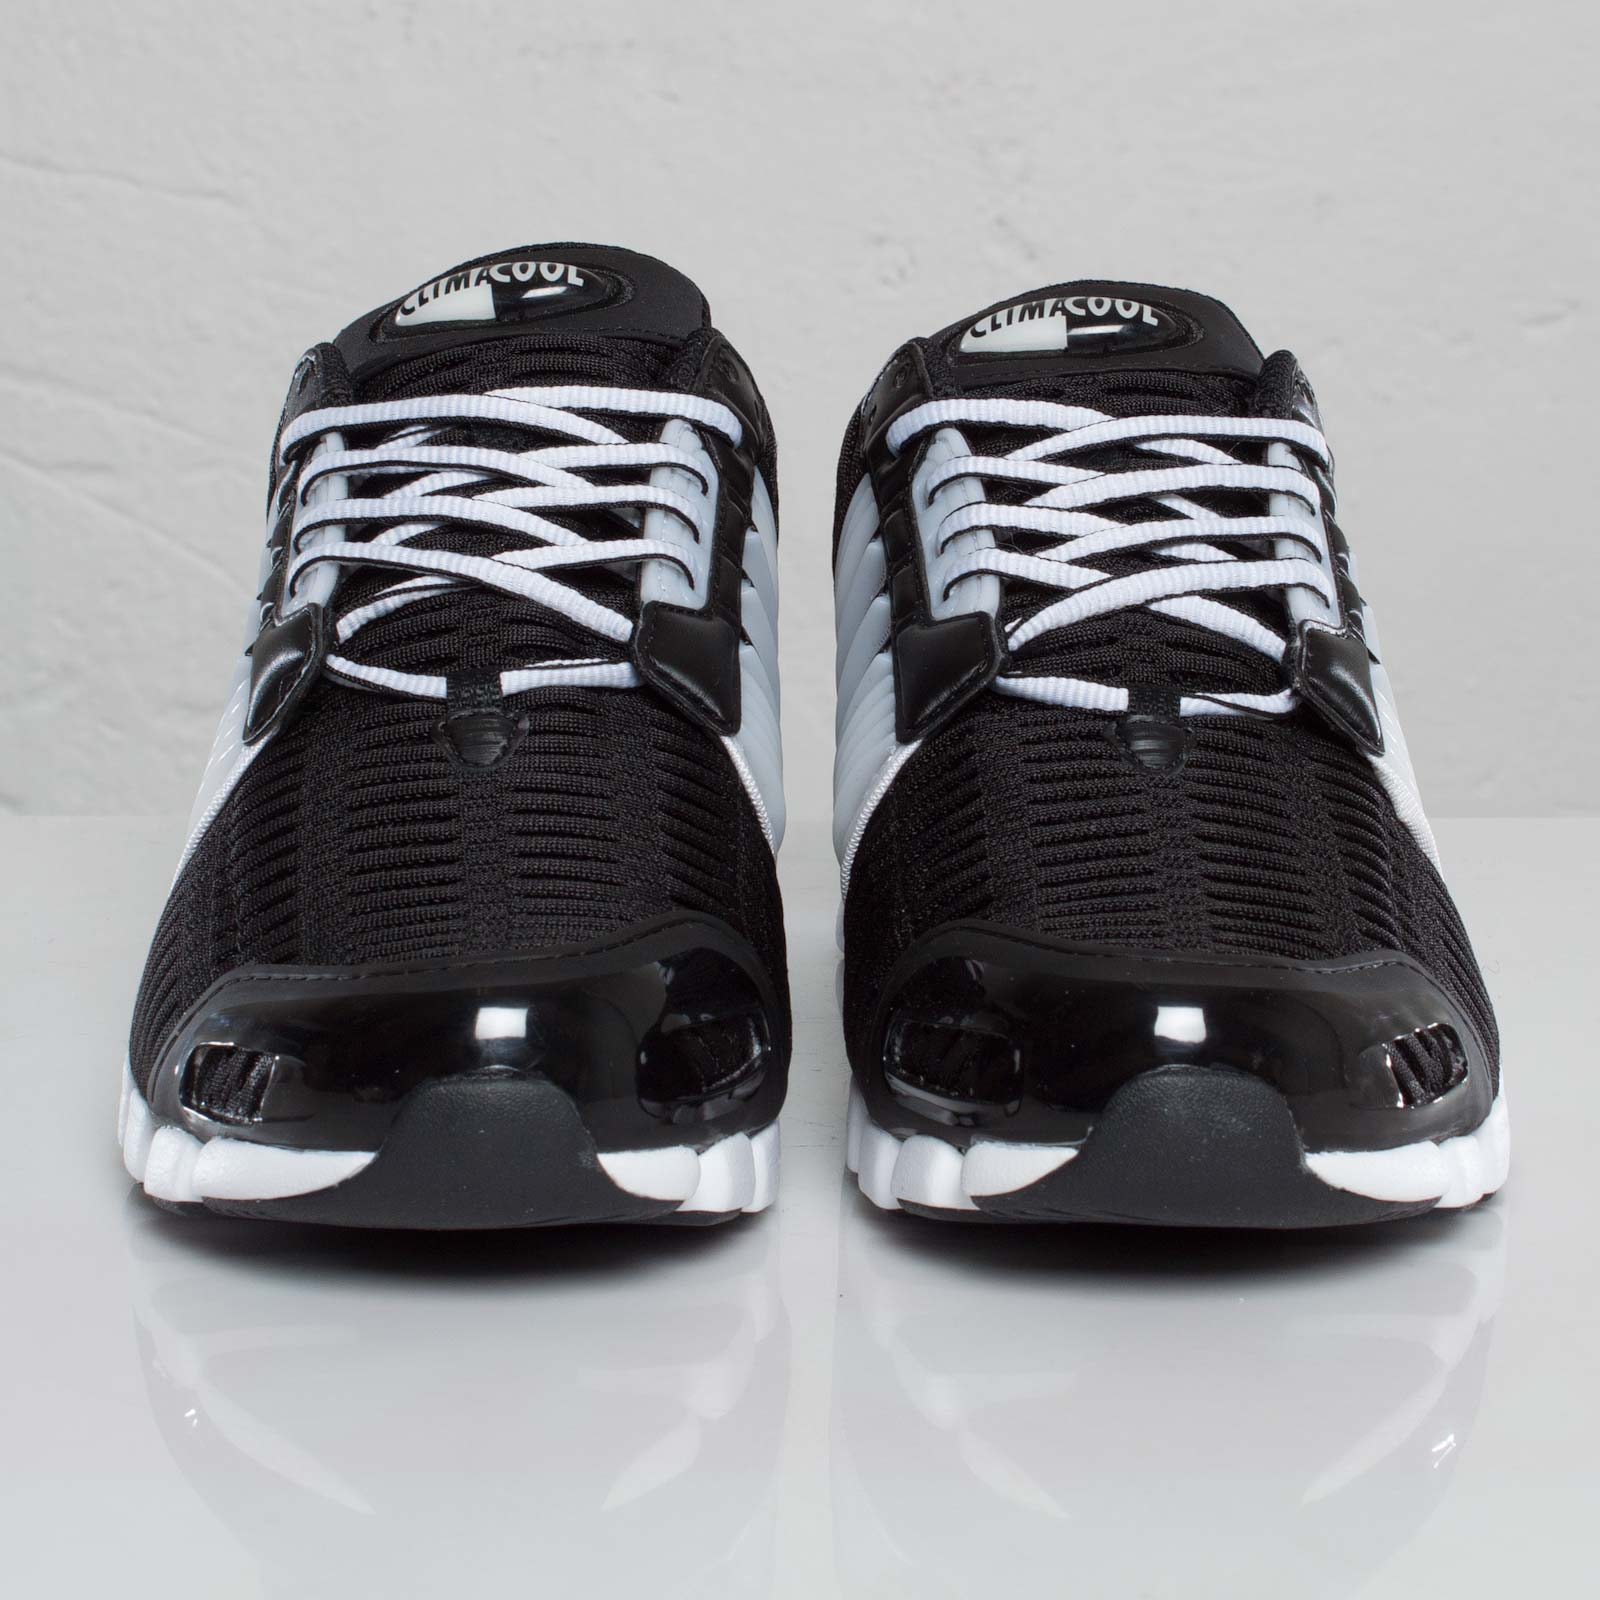 sale retailer b748f b7586 adidas Mega Torsion Flex CC - 109472 - Sneakersnstuff   sneakers    streetwear online since 1999